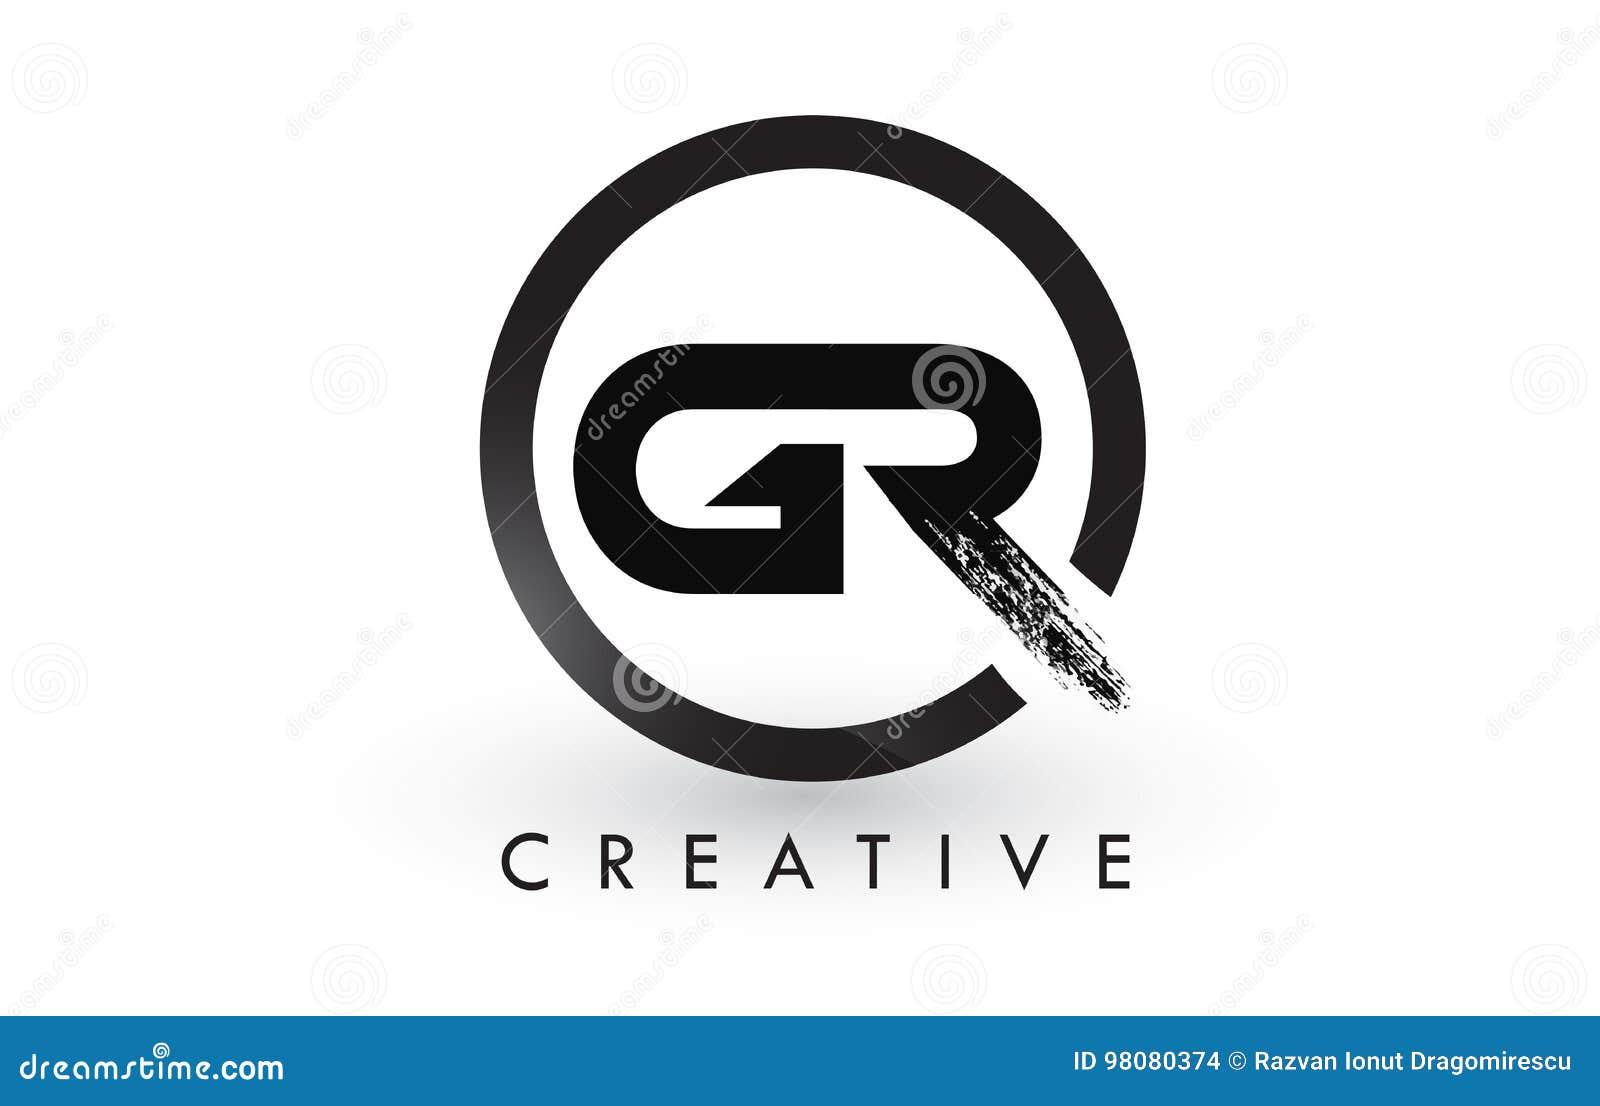 2625675ccc92 GR Brush Letter Logo Design. Creative Brushed Letters Icon Logo ...